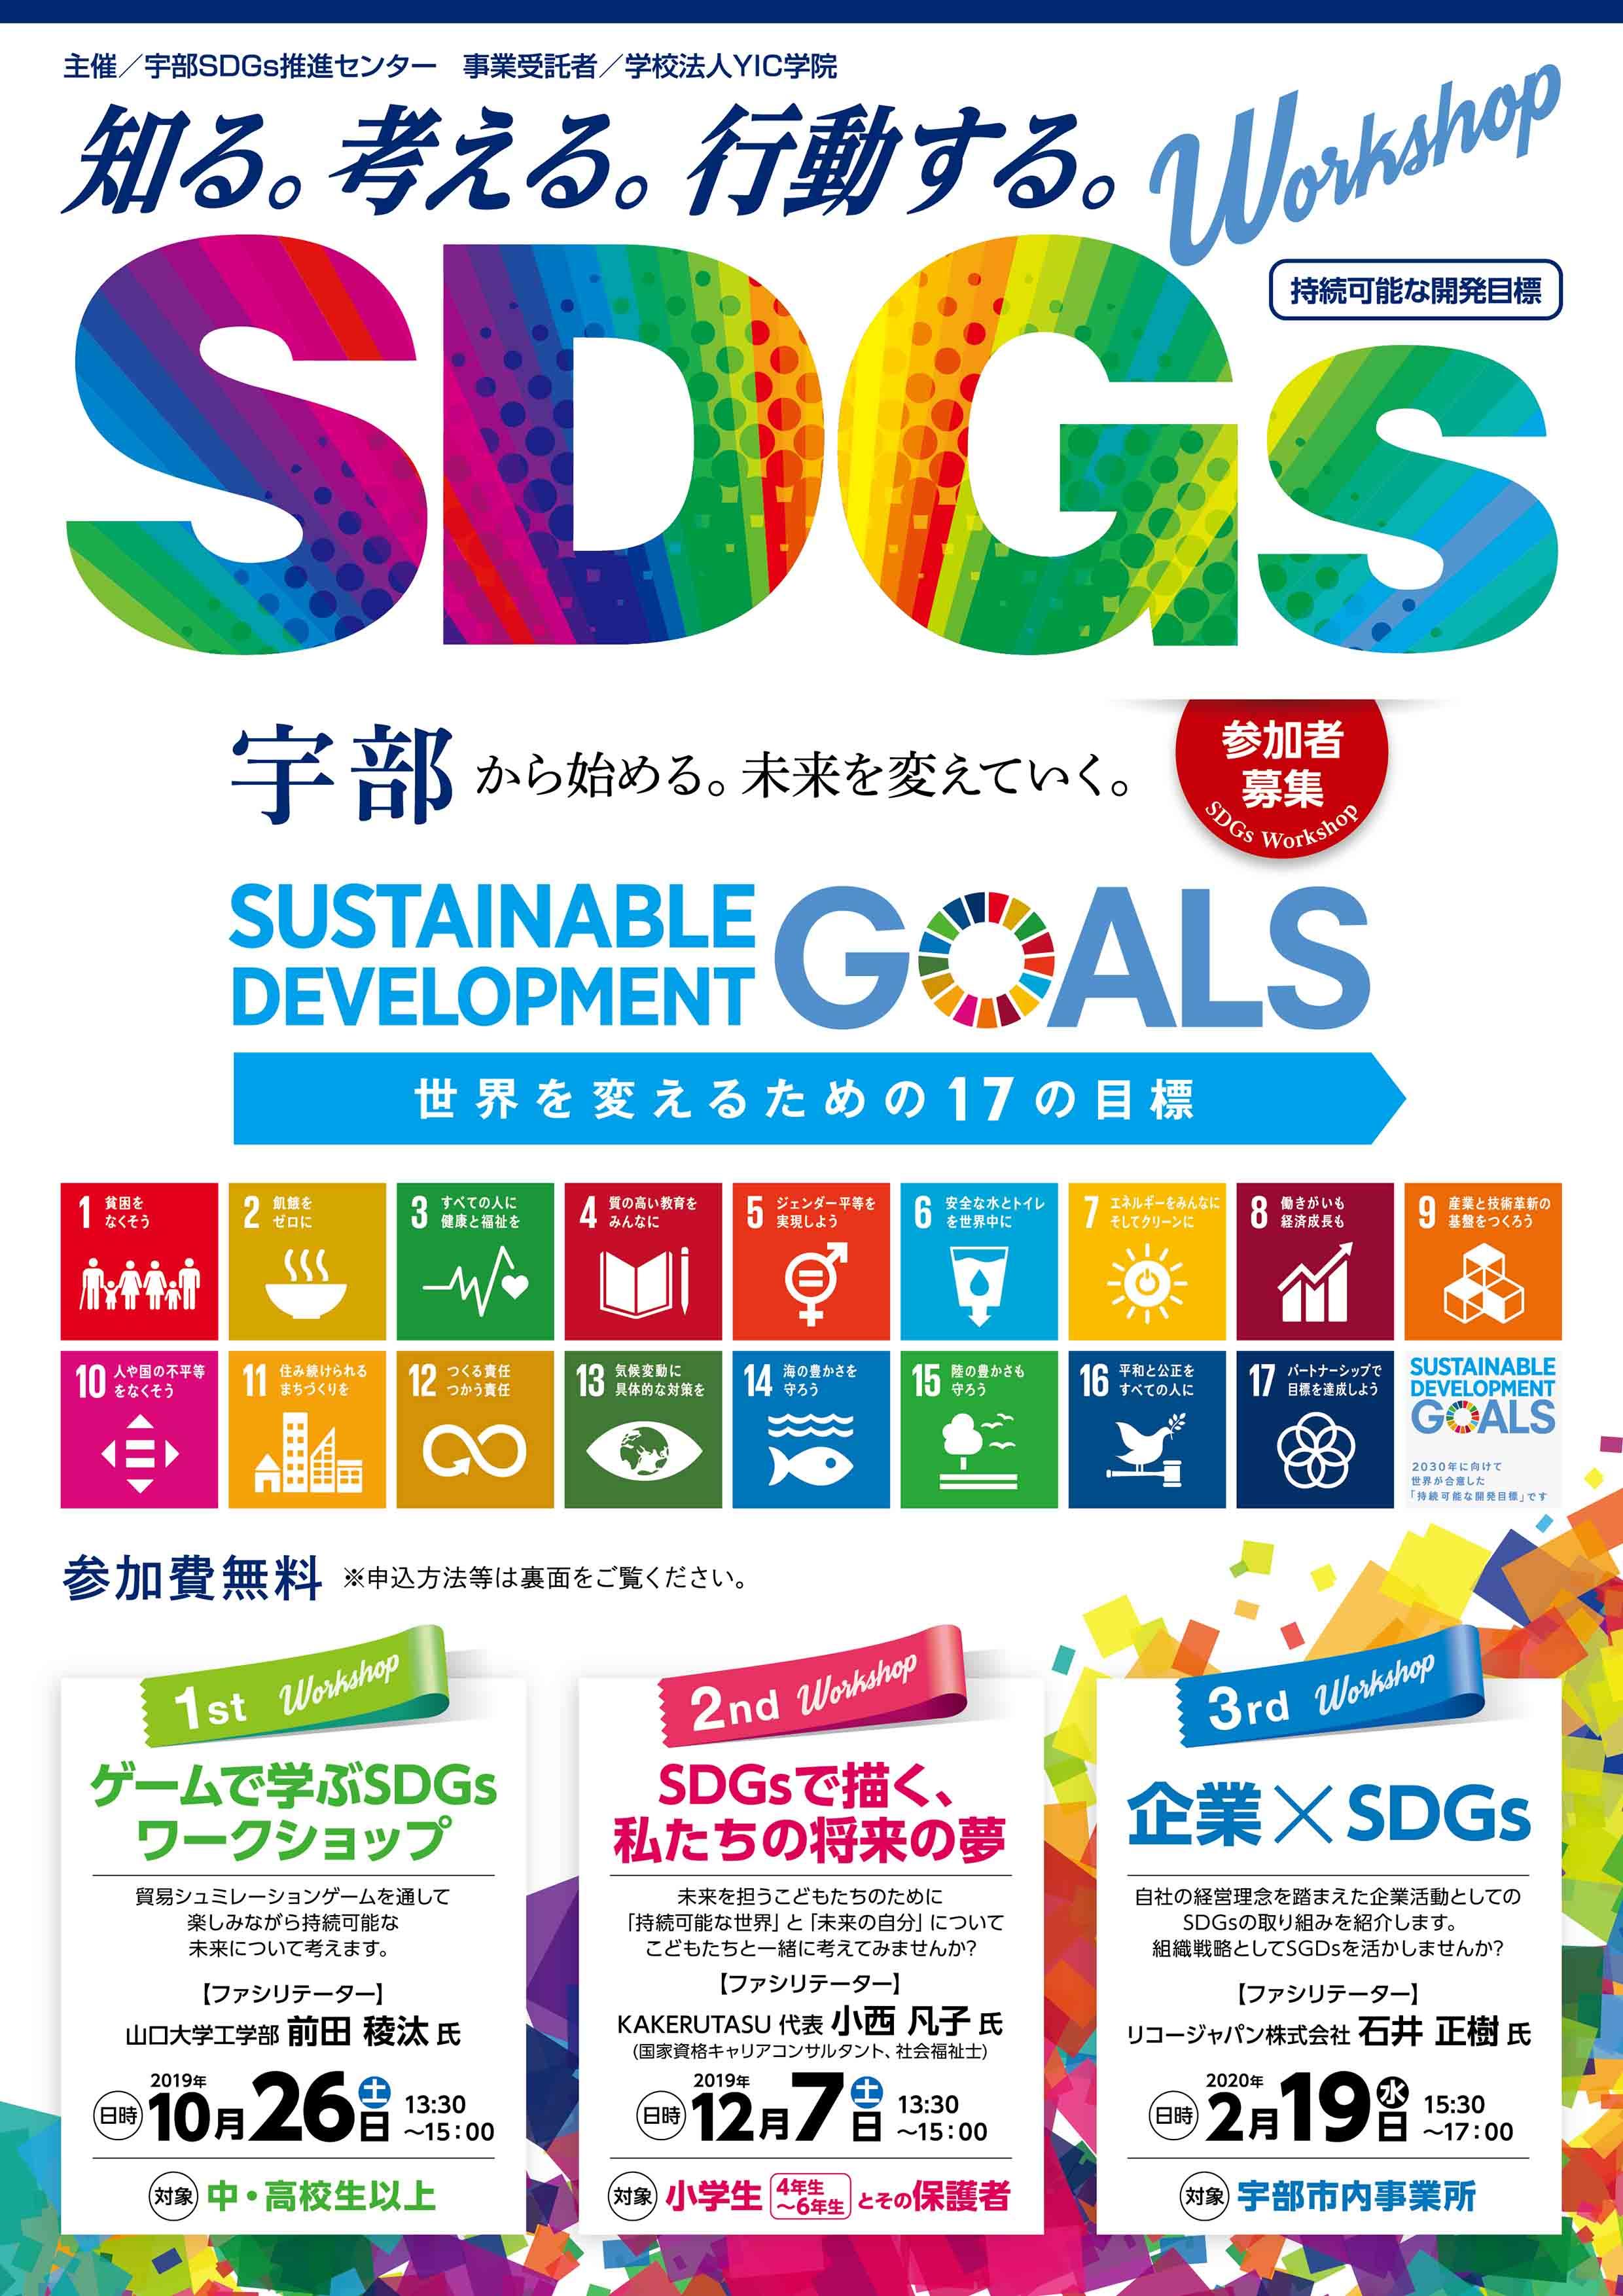 SDGsワークショップ 「企業×SDGs」